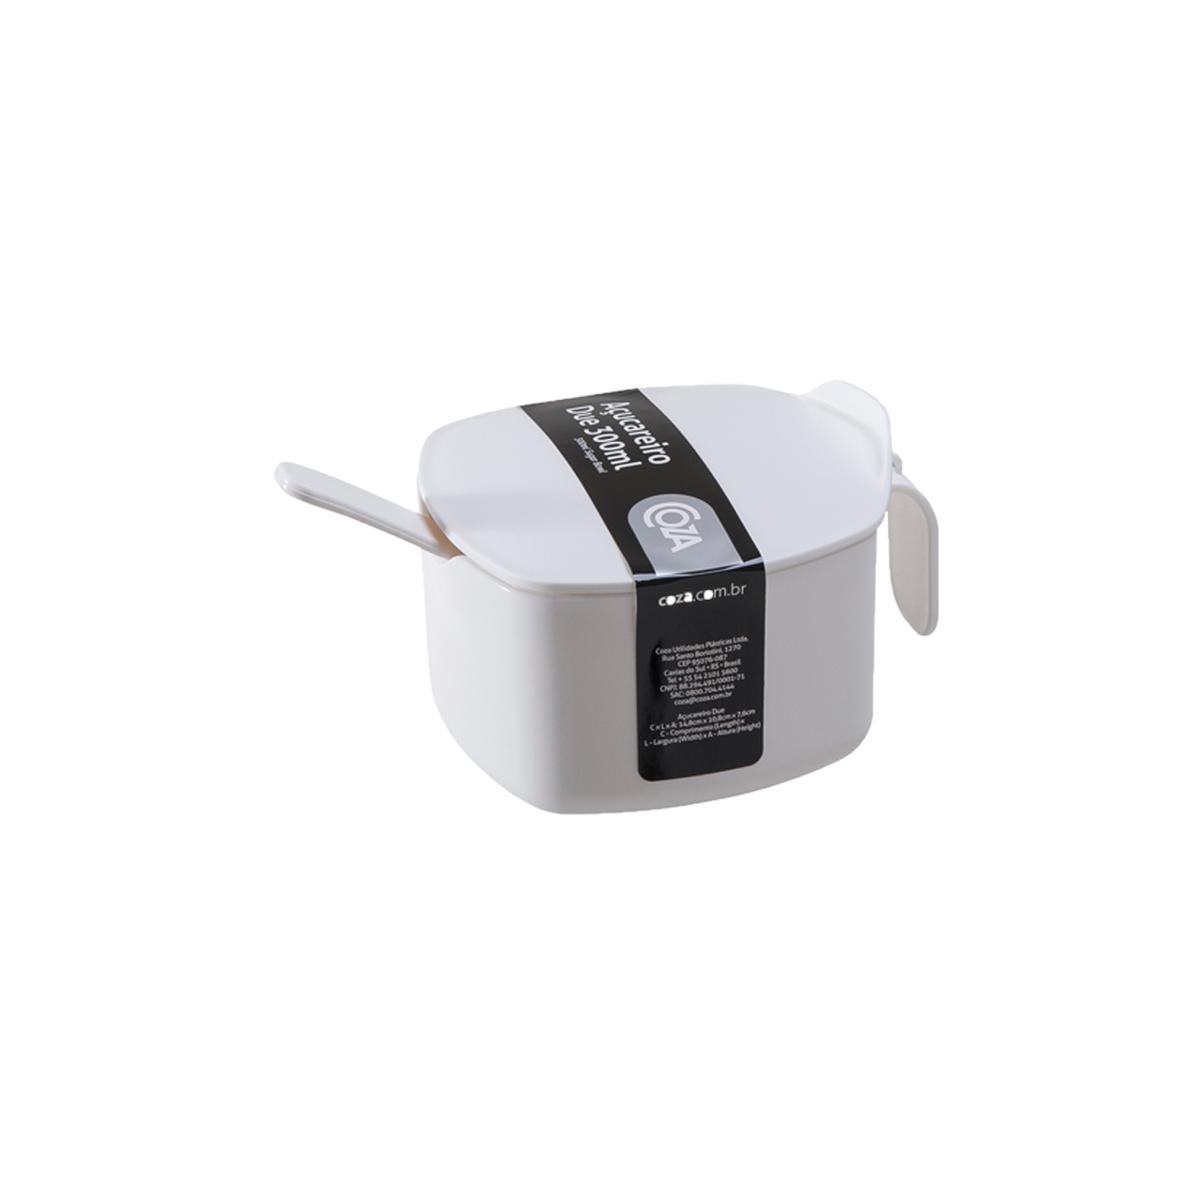 Acucareiro de Plastico 300 g Branco - Due Coza